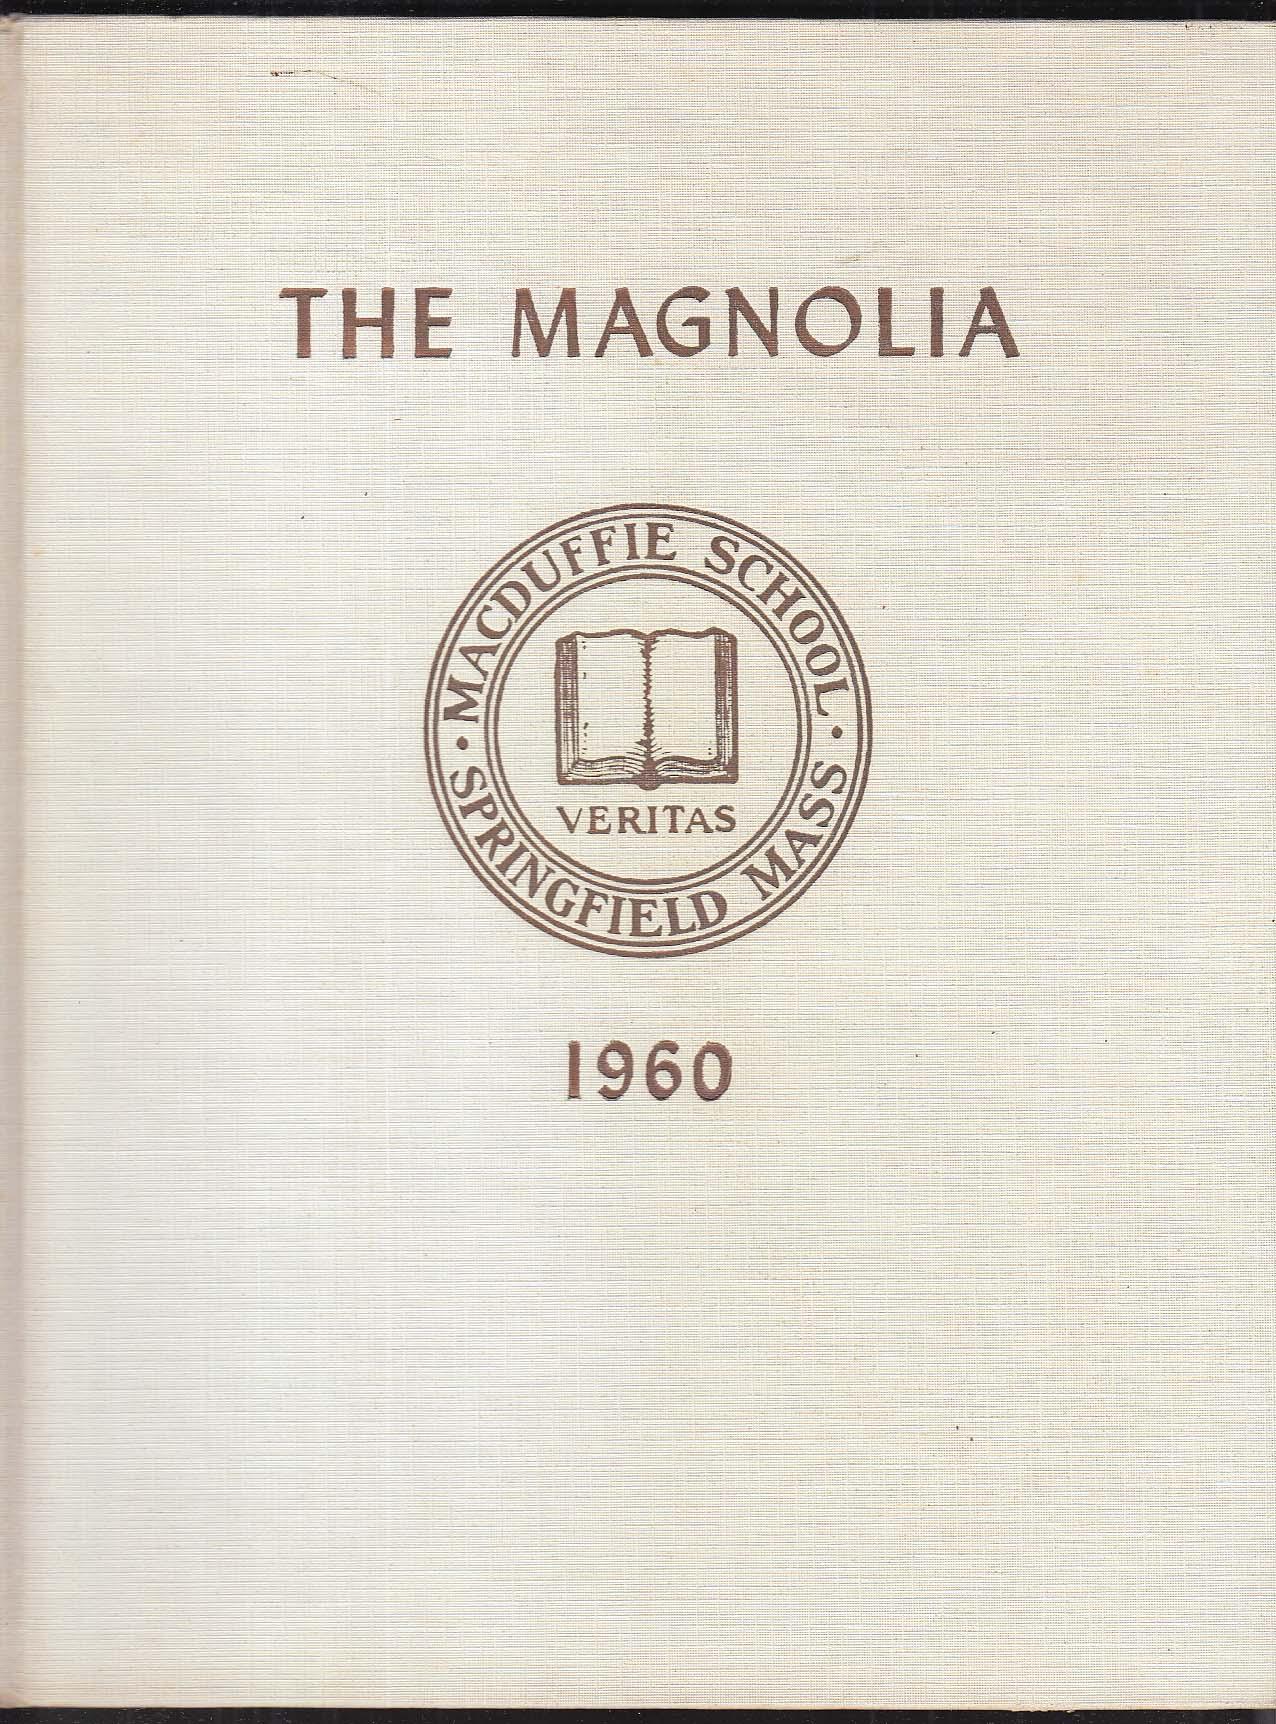 Image for The Magnolia MacDuffie School 1960 Yearbook Springfield Massachusetts